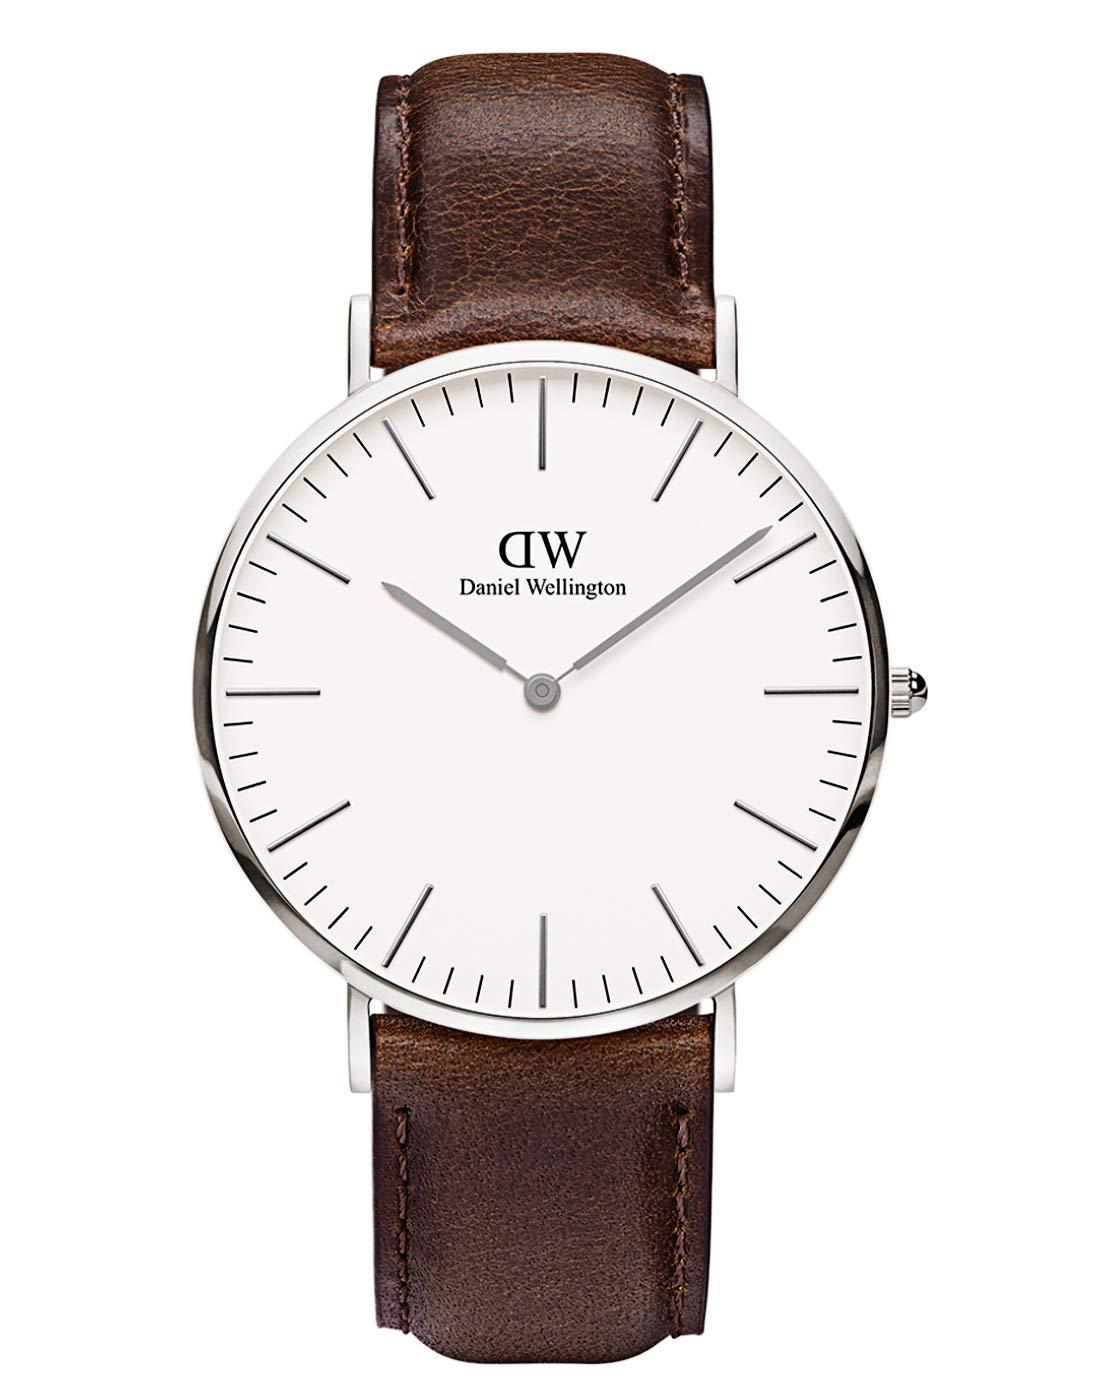 Daniel Wellington Trenduhren  Classic Bristol, Dunkelbraun/Silber Uhr, 40mm, Leder, für Herren